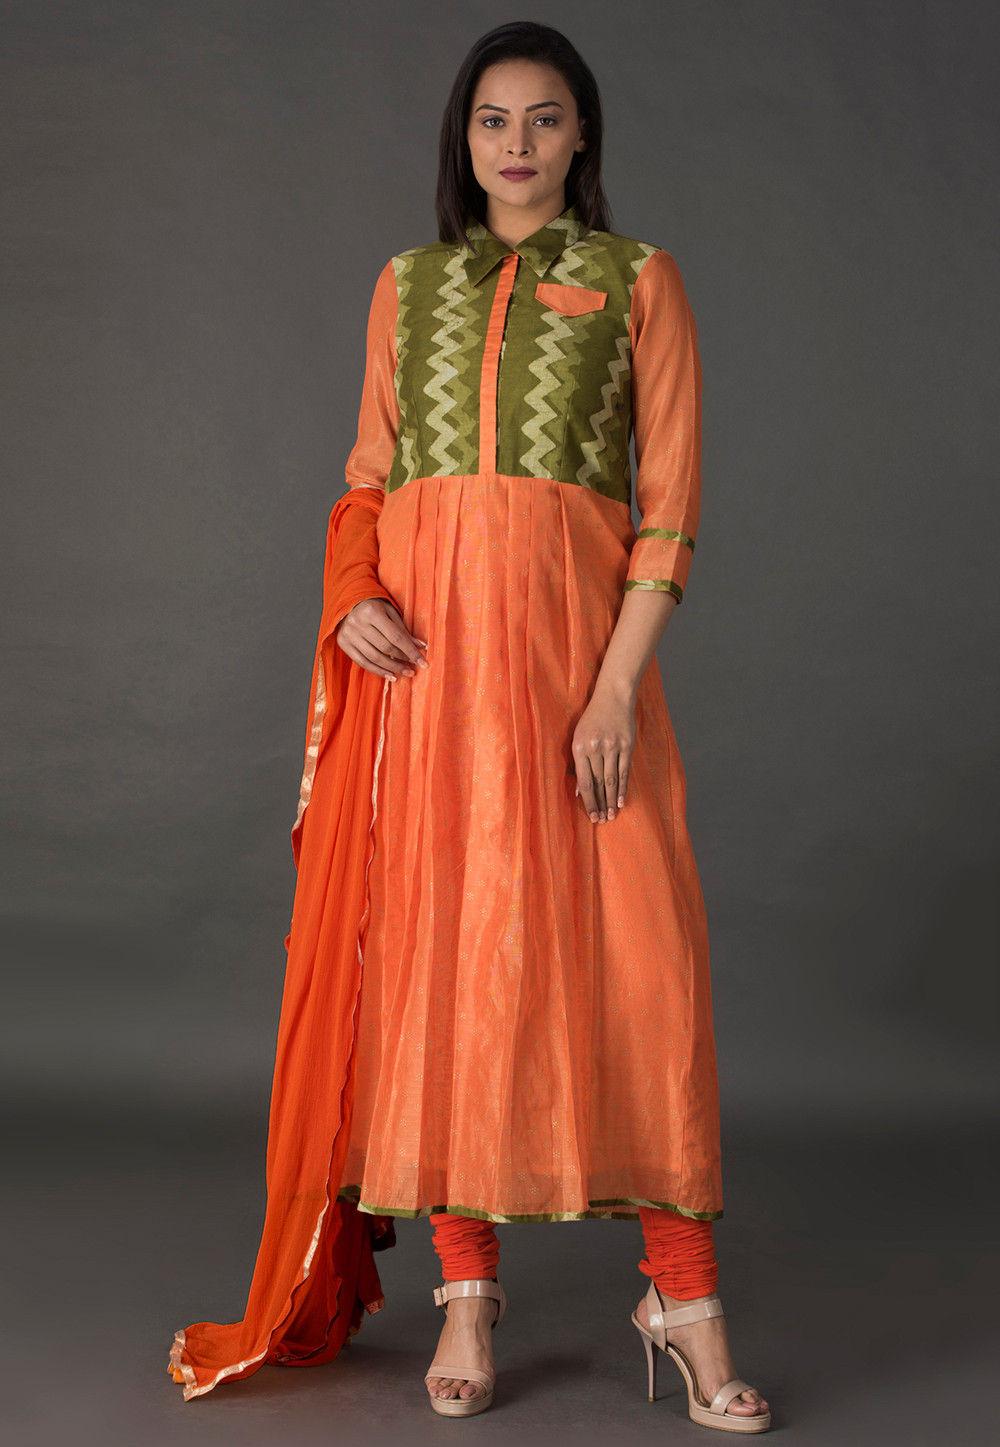 Block Printed Chanderi Silk A Line Suit in Orange and Green